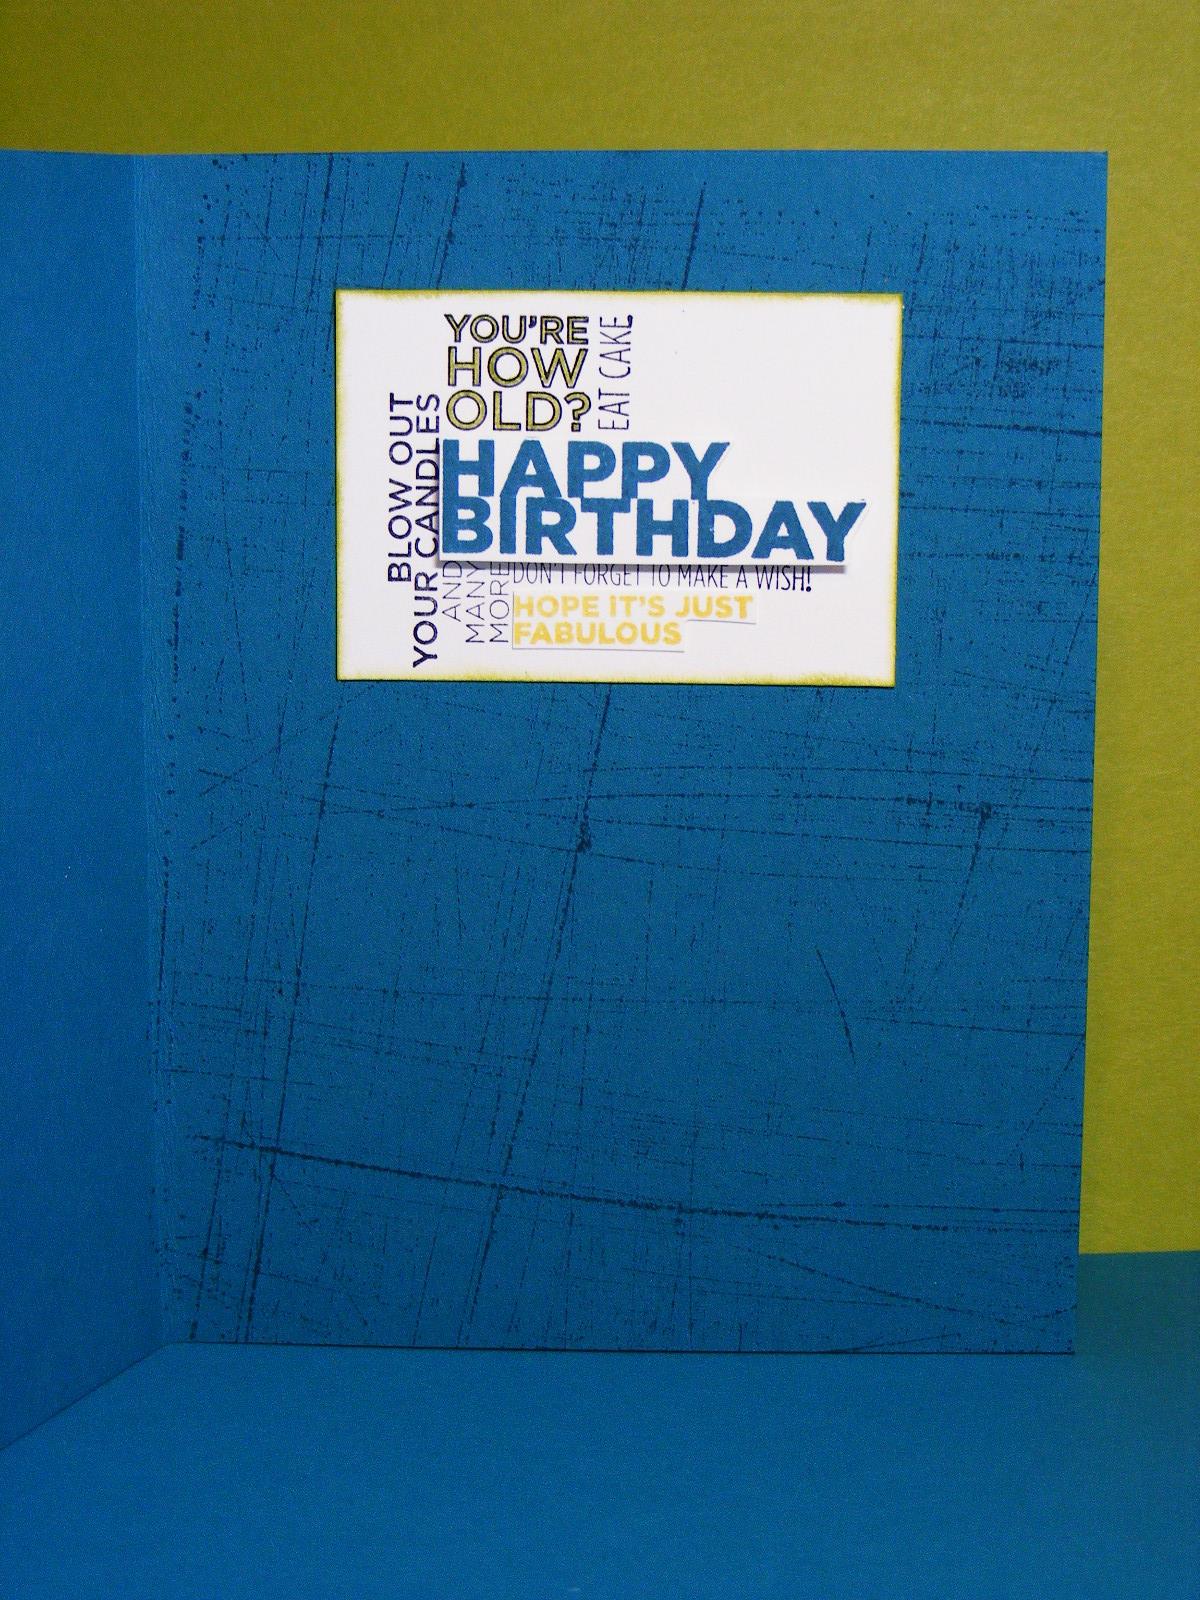 A La Cards 16 year old Boy birthday for PPA105